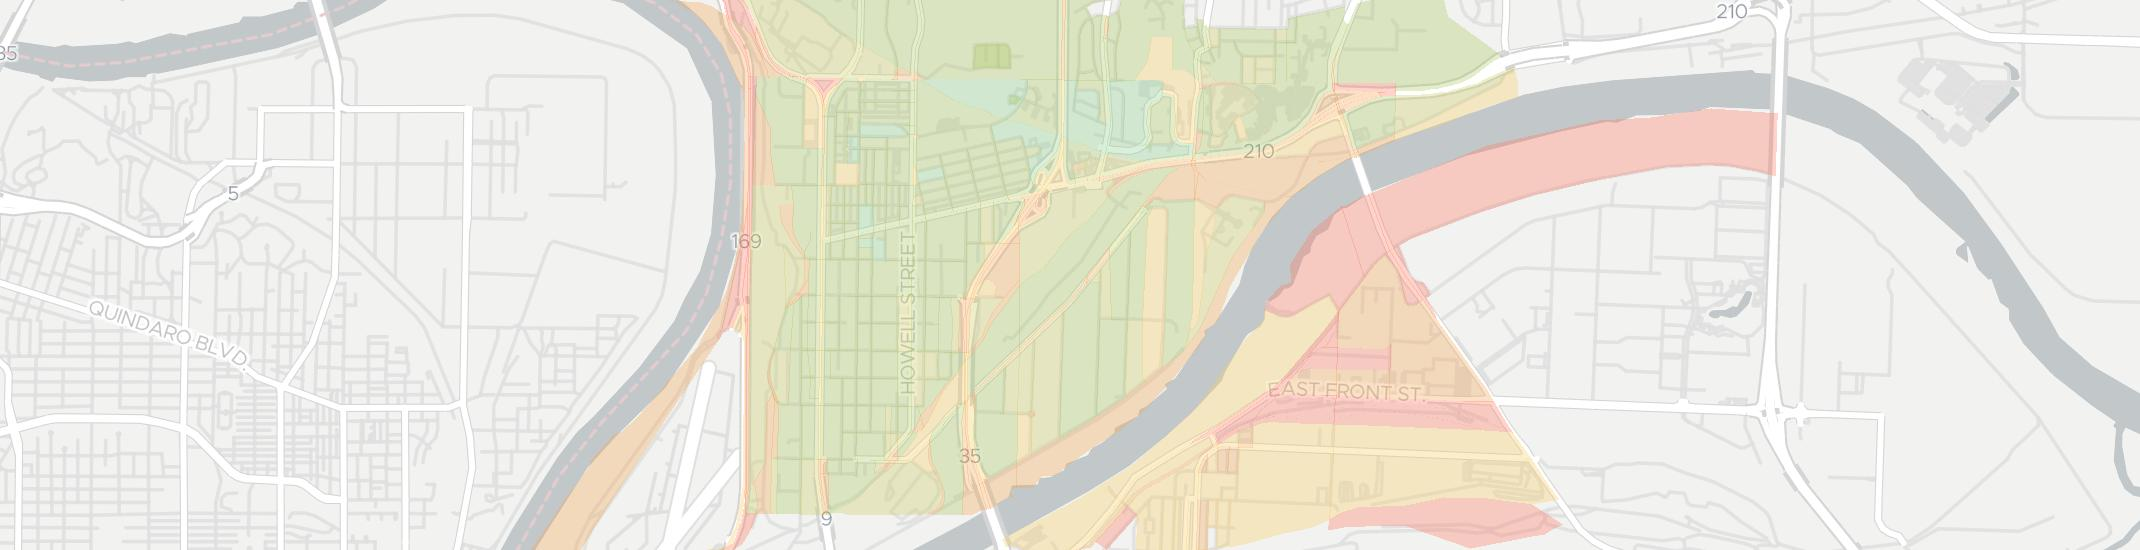 Internet Providers In North Kansas City Mo Compare 21 Providers